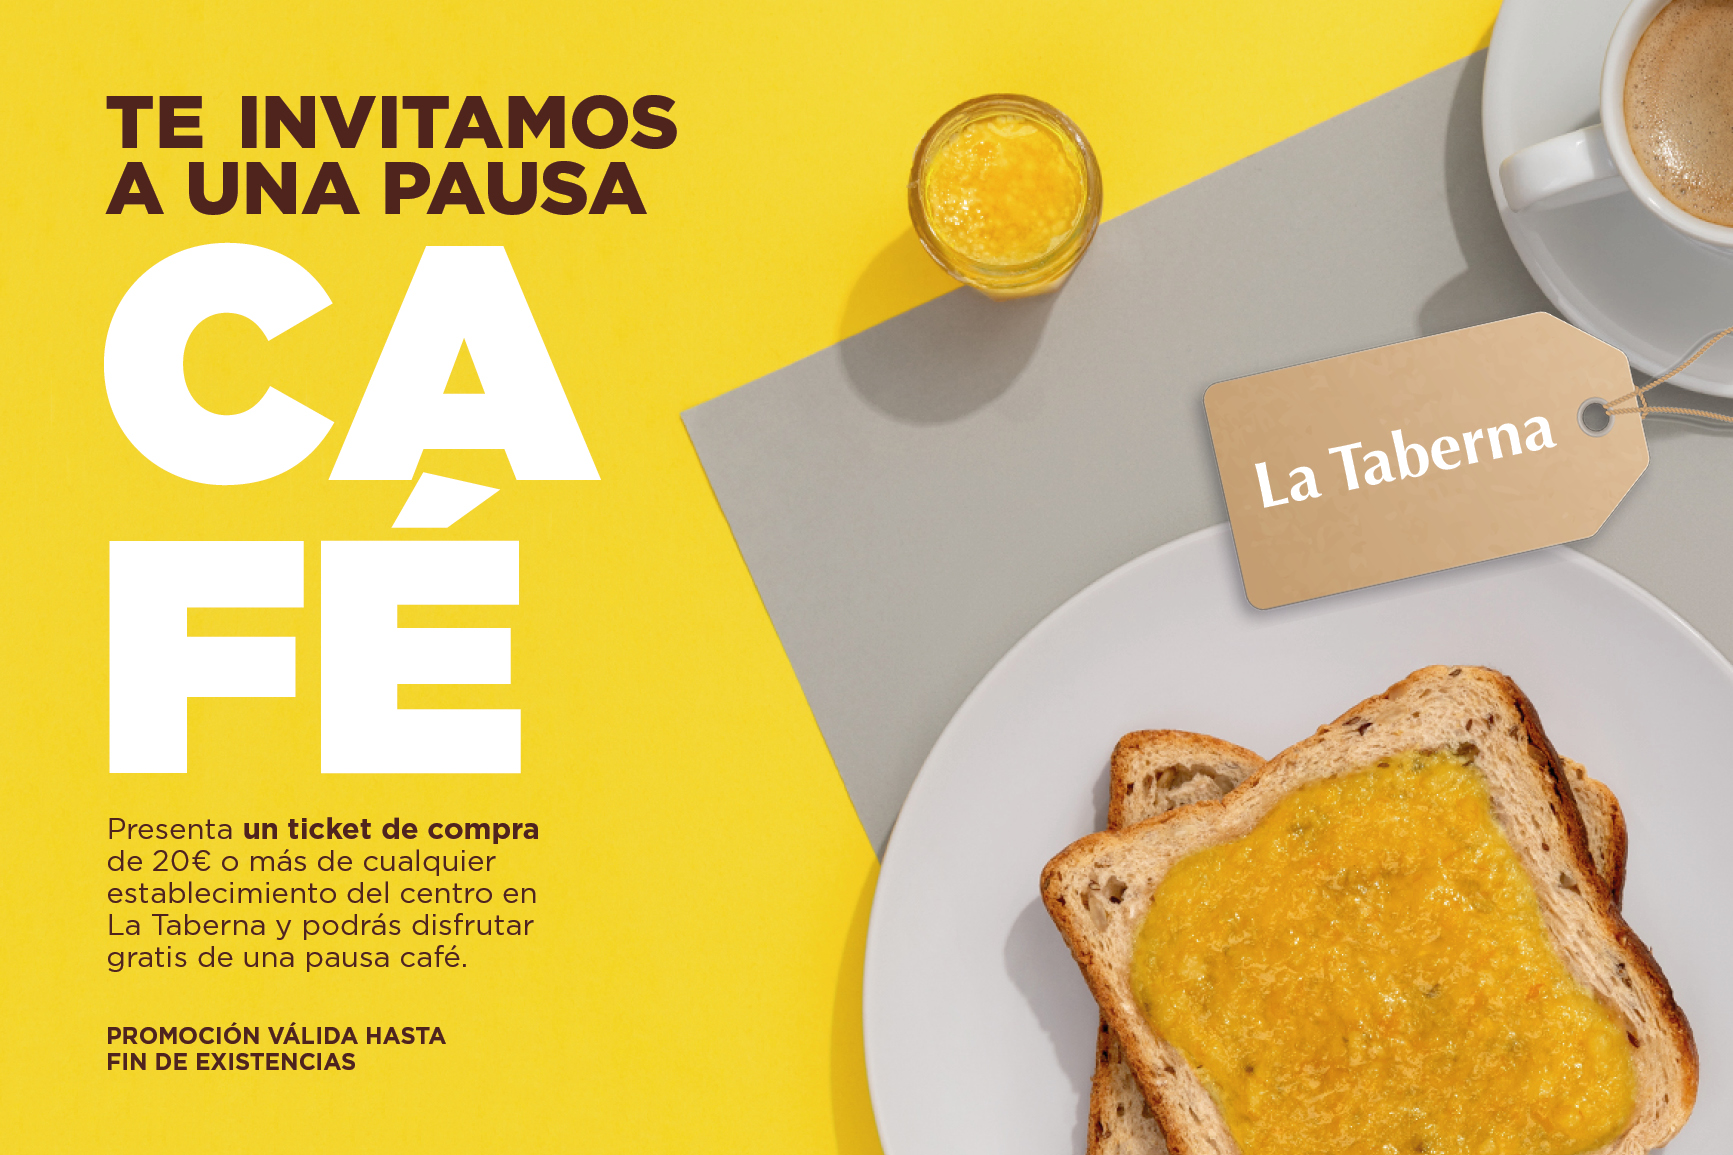 Gran sur_pausa cafe_2020_cabeceraweb 3 2